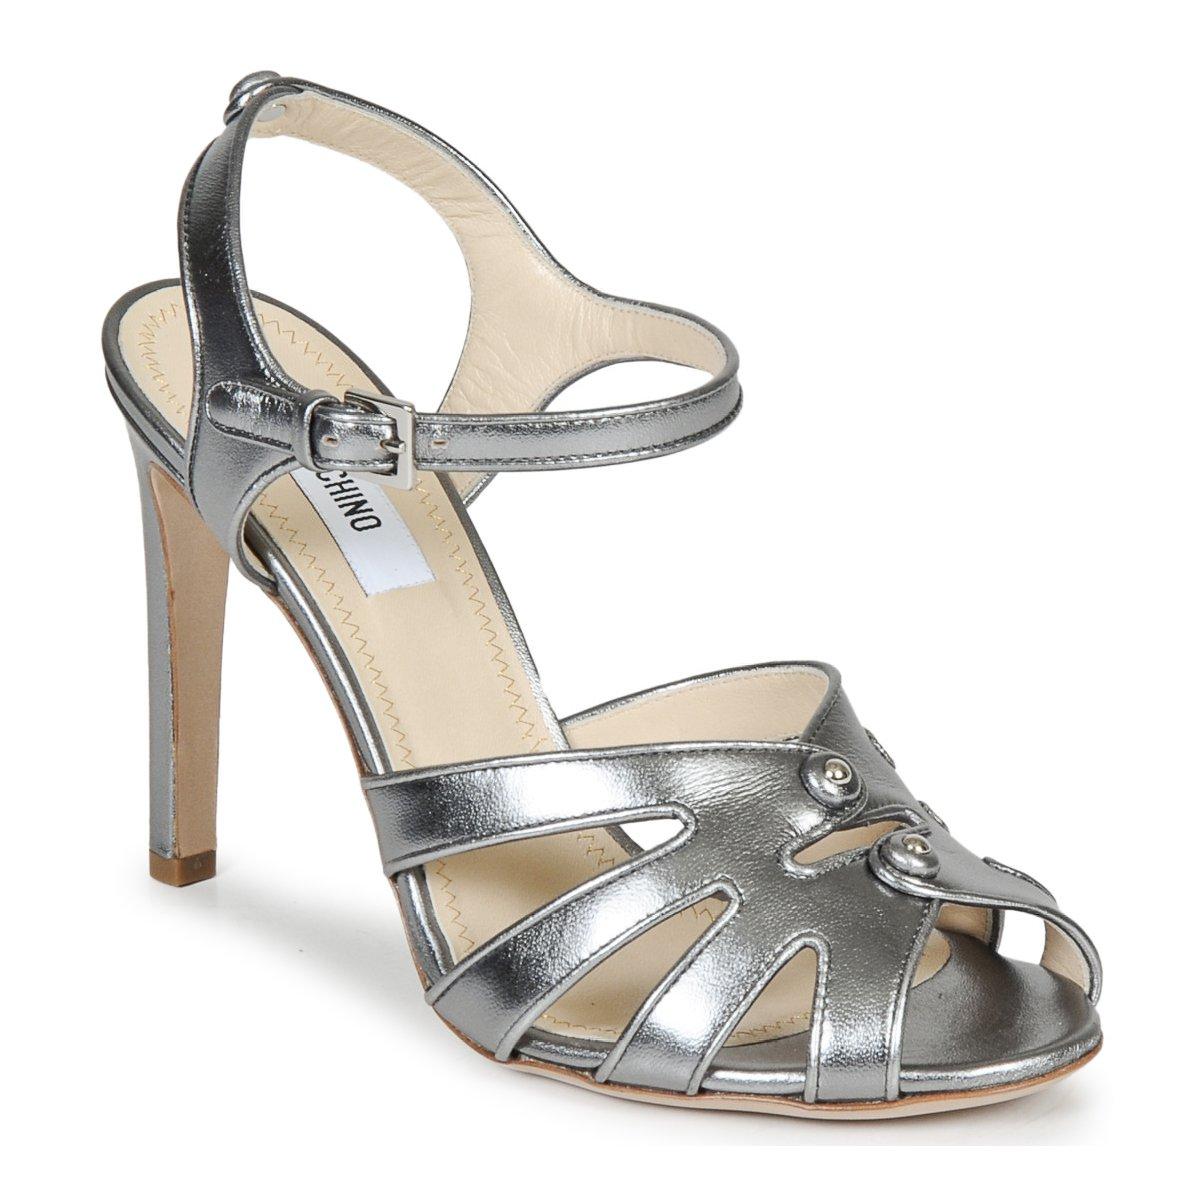 Sandale Moschino MA1604 NAPPA-ACCAI